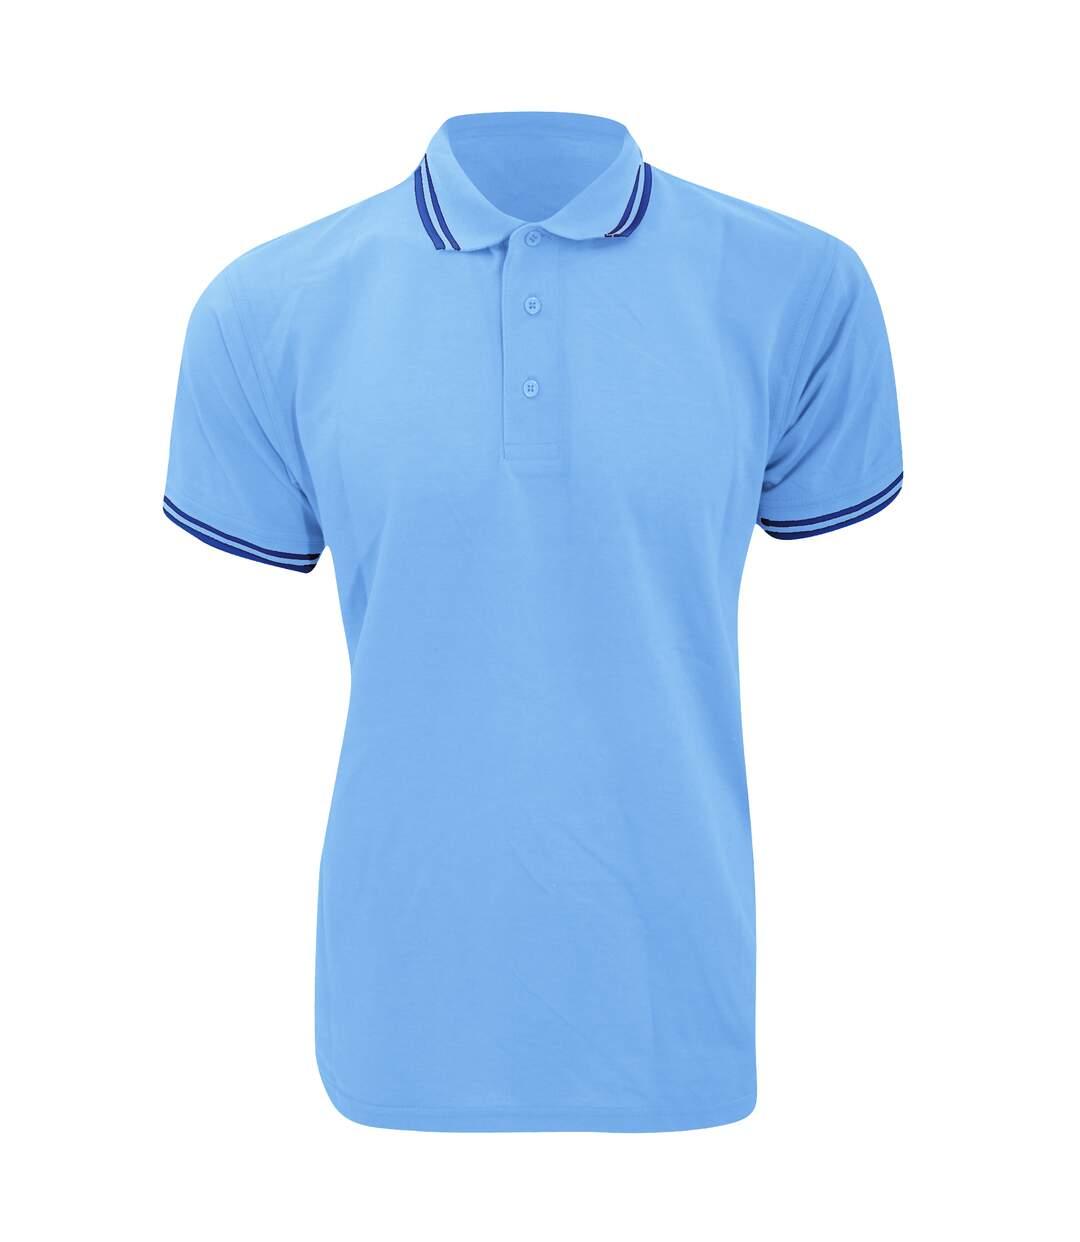 Kustom Kit Mens Tipped Piqué Short Sleeve Polo Shirt (Black/Red) - UTBC613